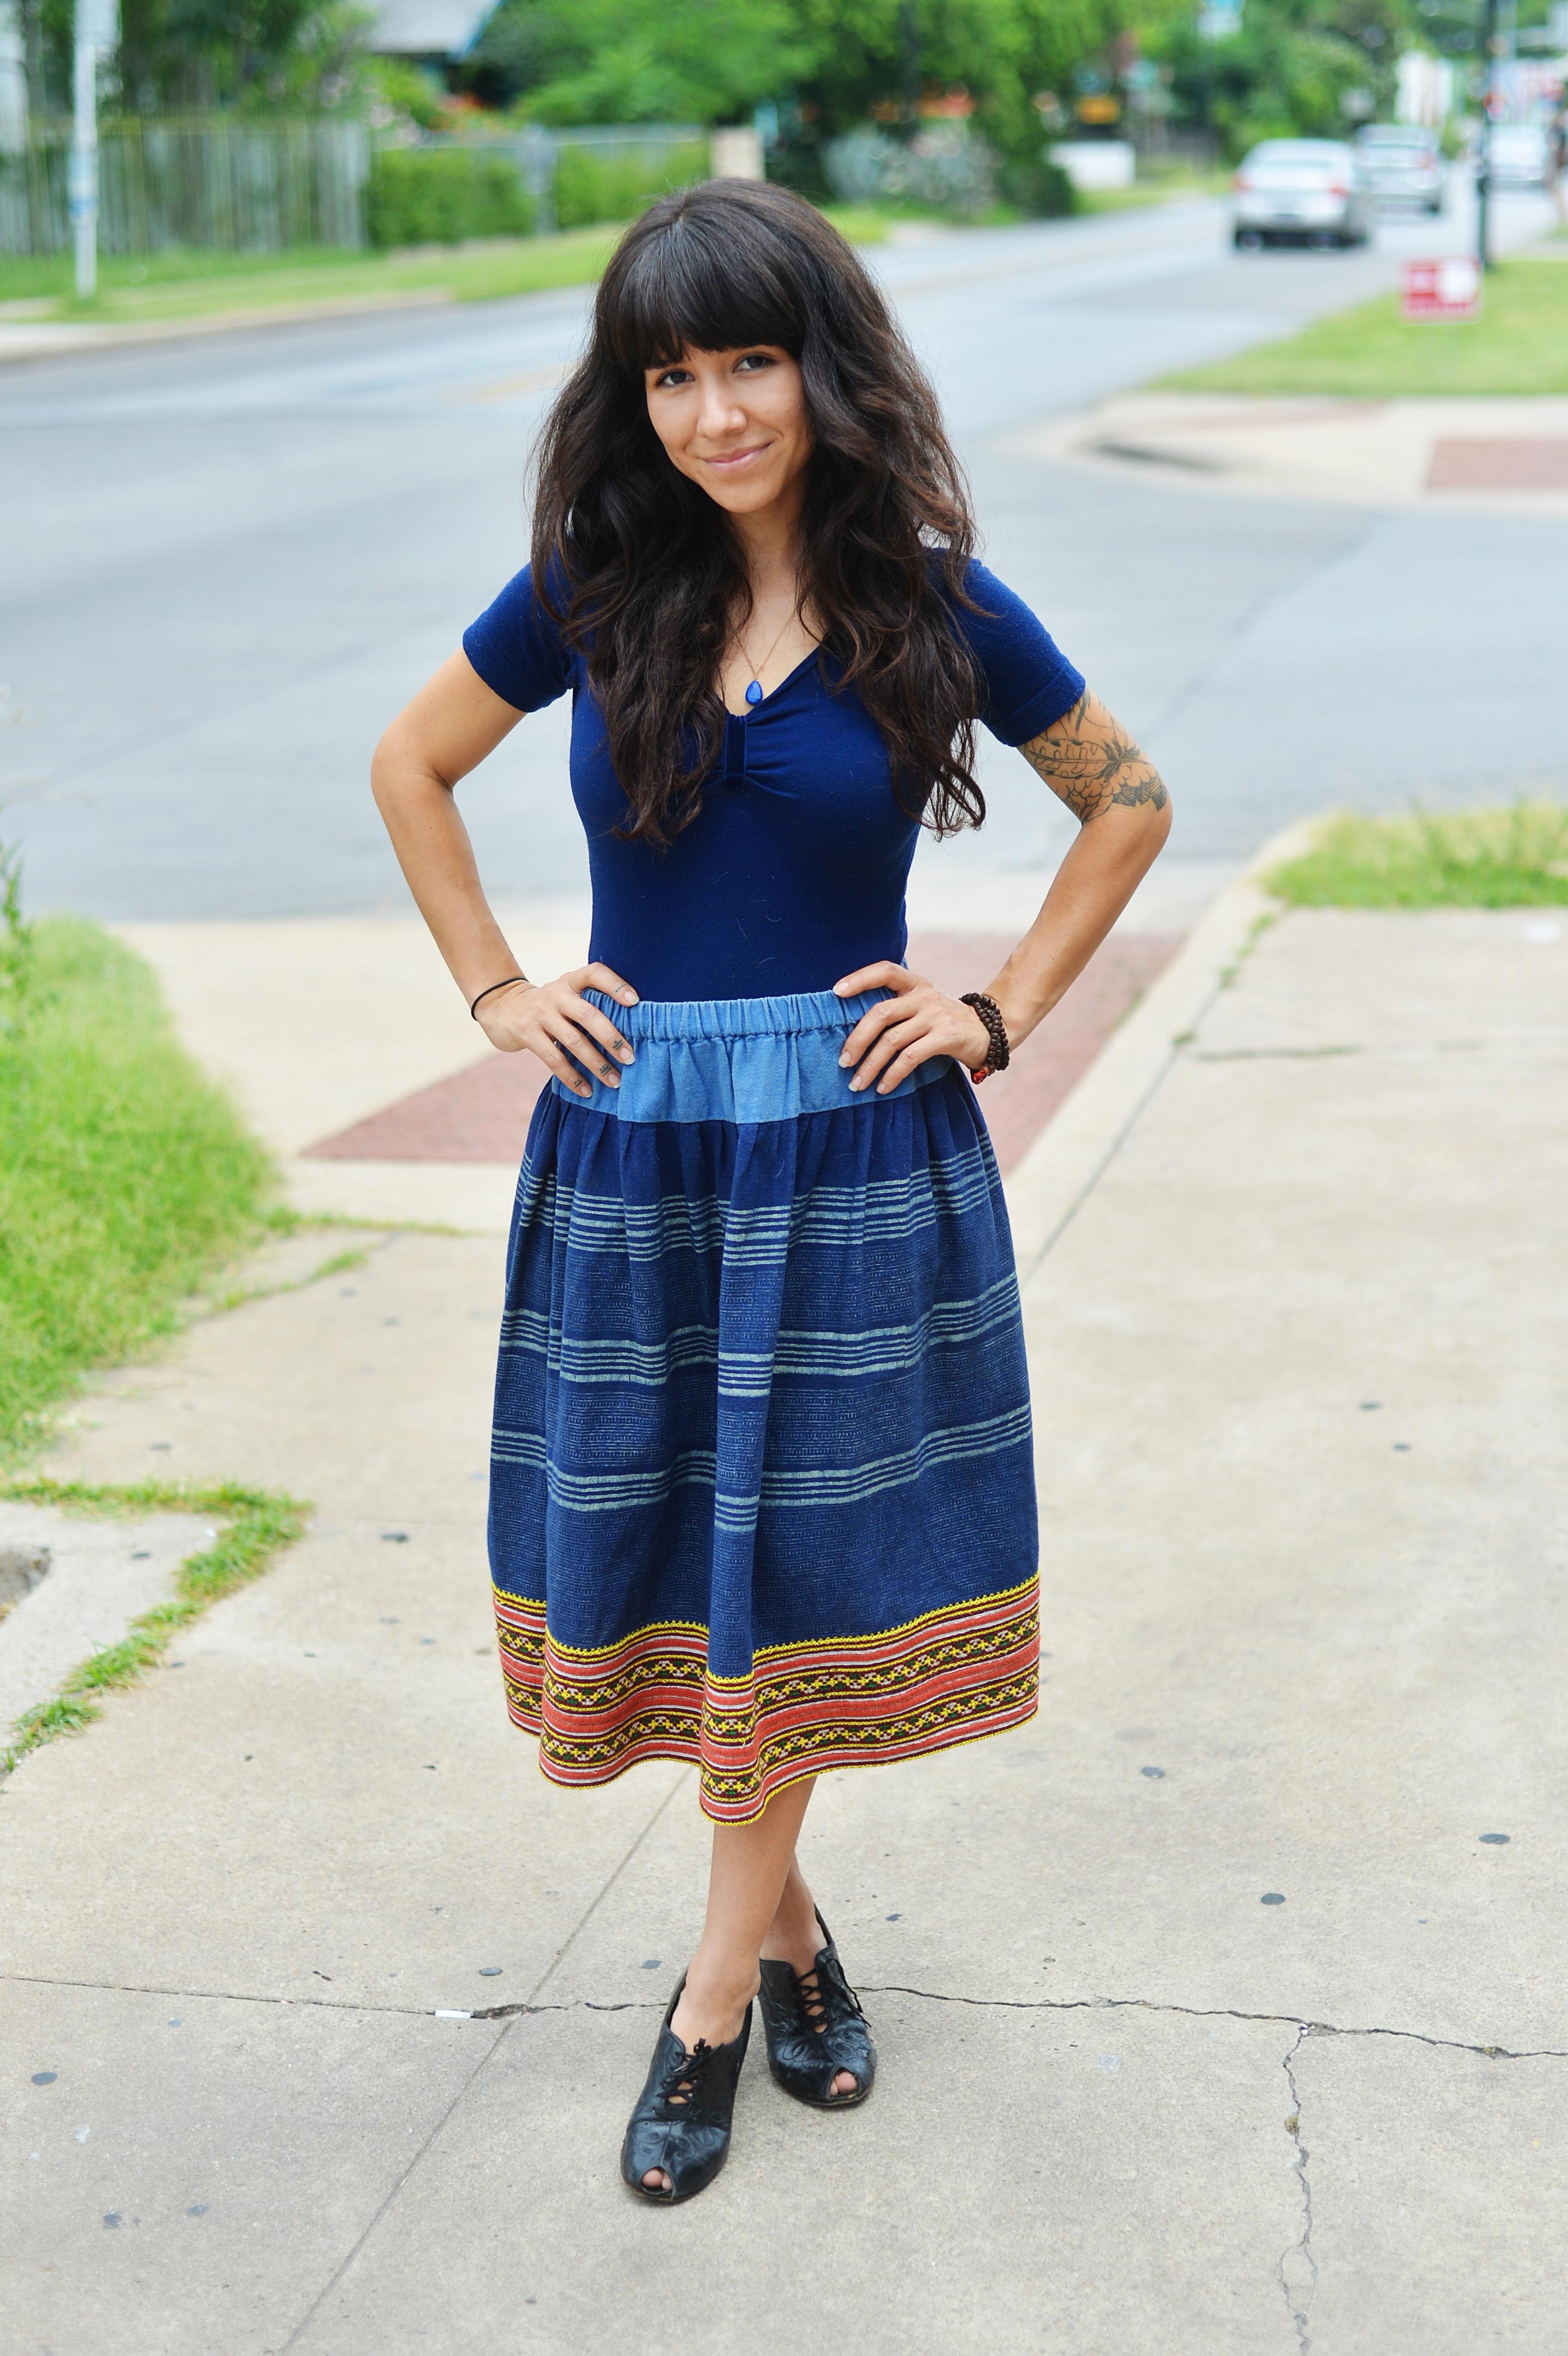 60b6d02fc4c6 Street Style Pic of the Week: Tamara Valdez - Keep Austin Stylish